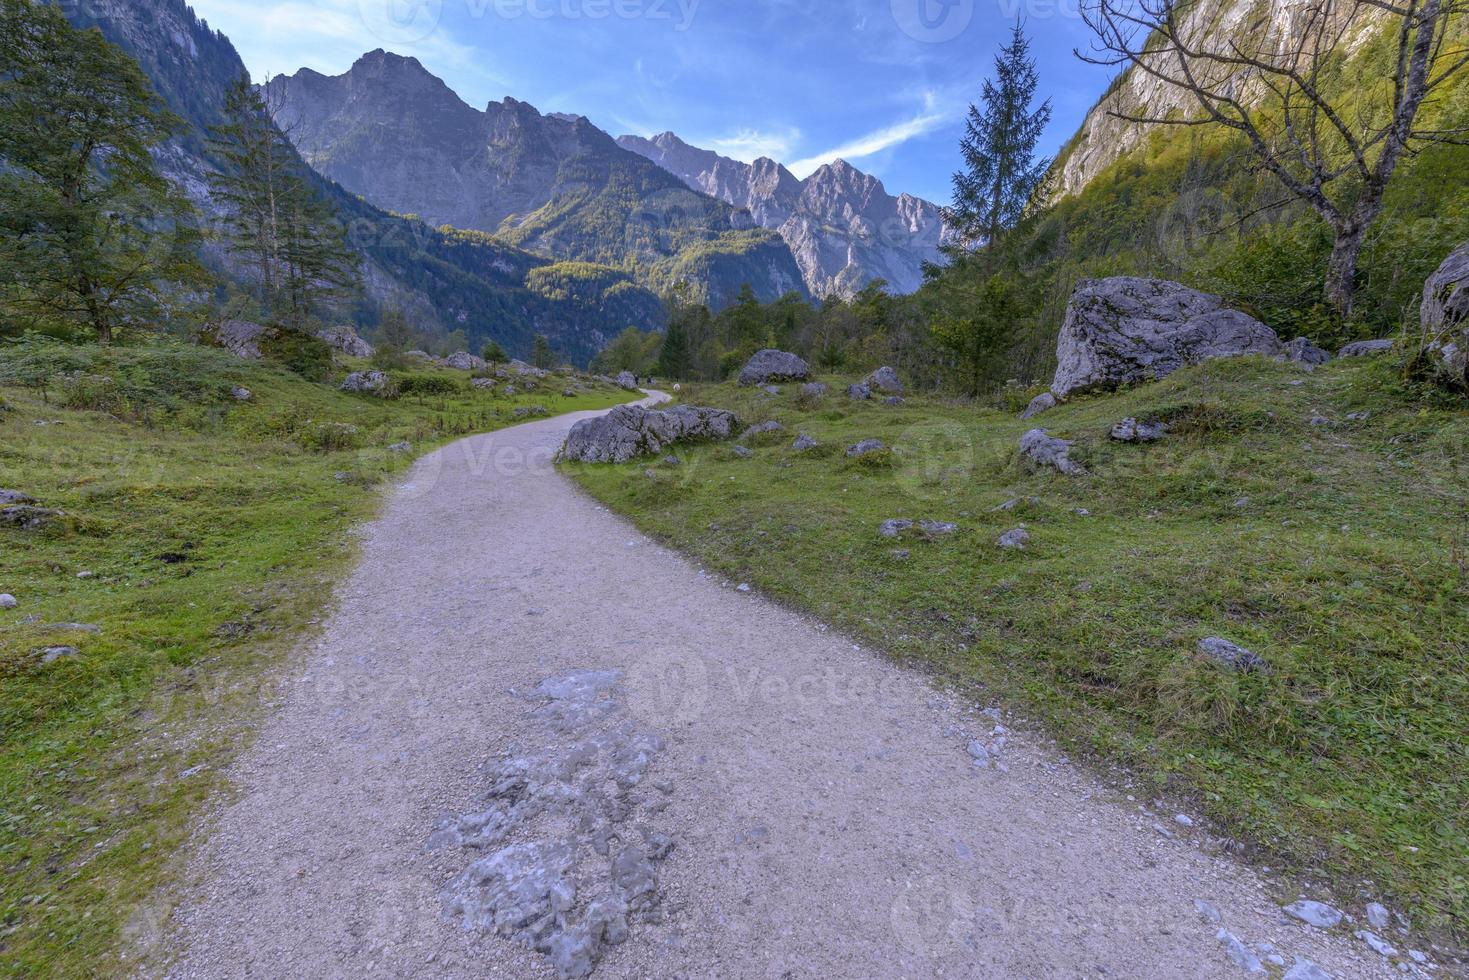 road to obersee, parco nazionale di berchtesgaden foto